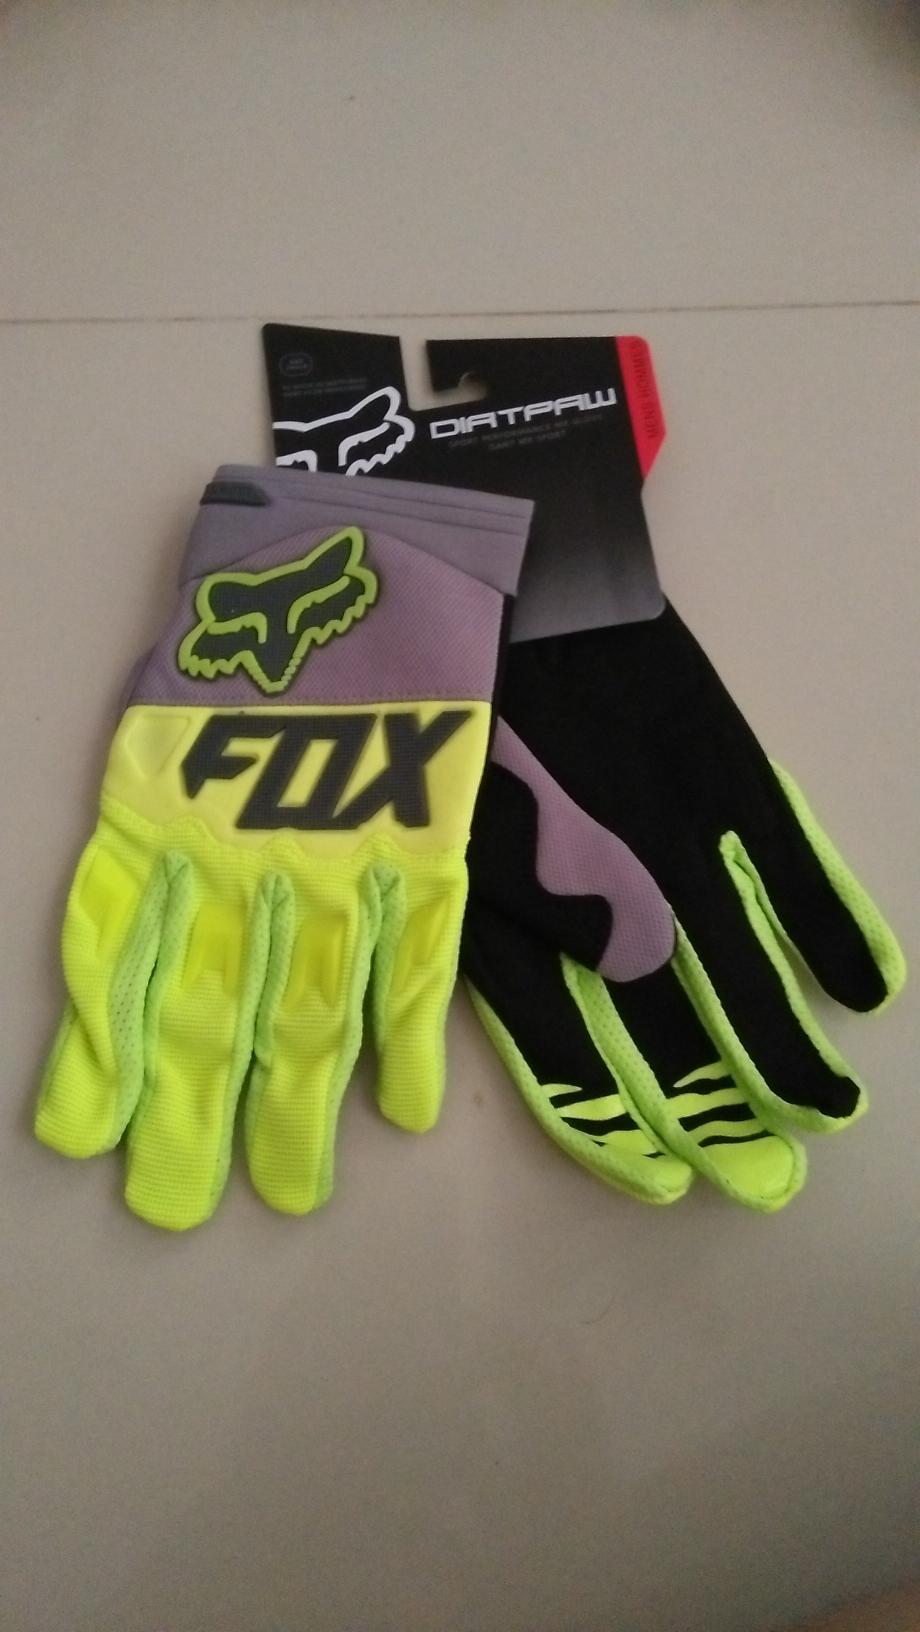 Hijau Fox Dirtpaw Sarung Tangan Sepeda Motor Touring Tour Bikers Bike Gloves Sports .